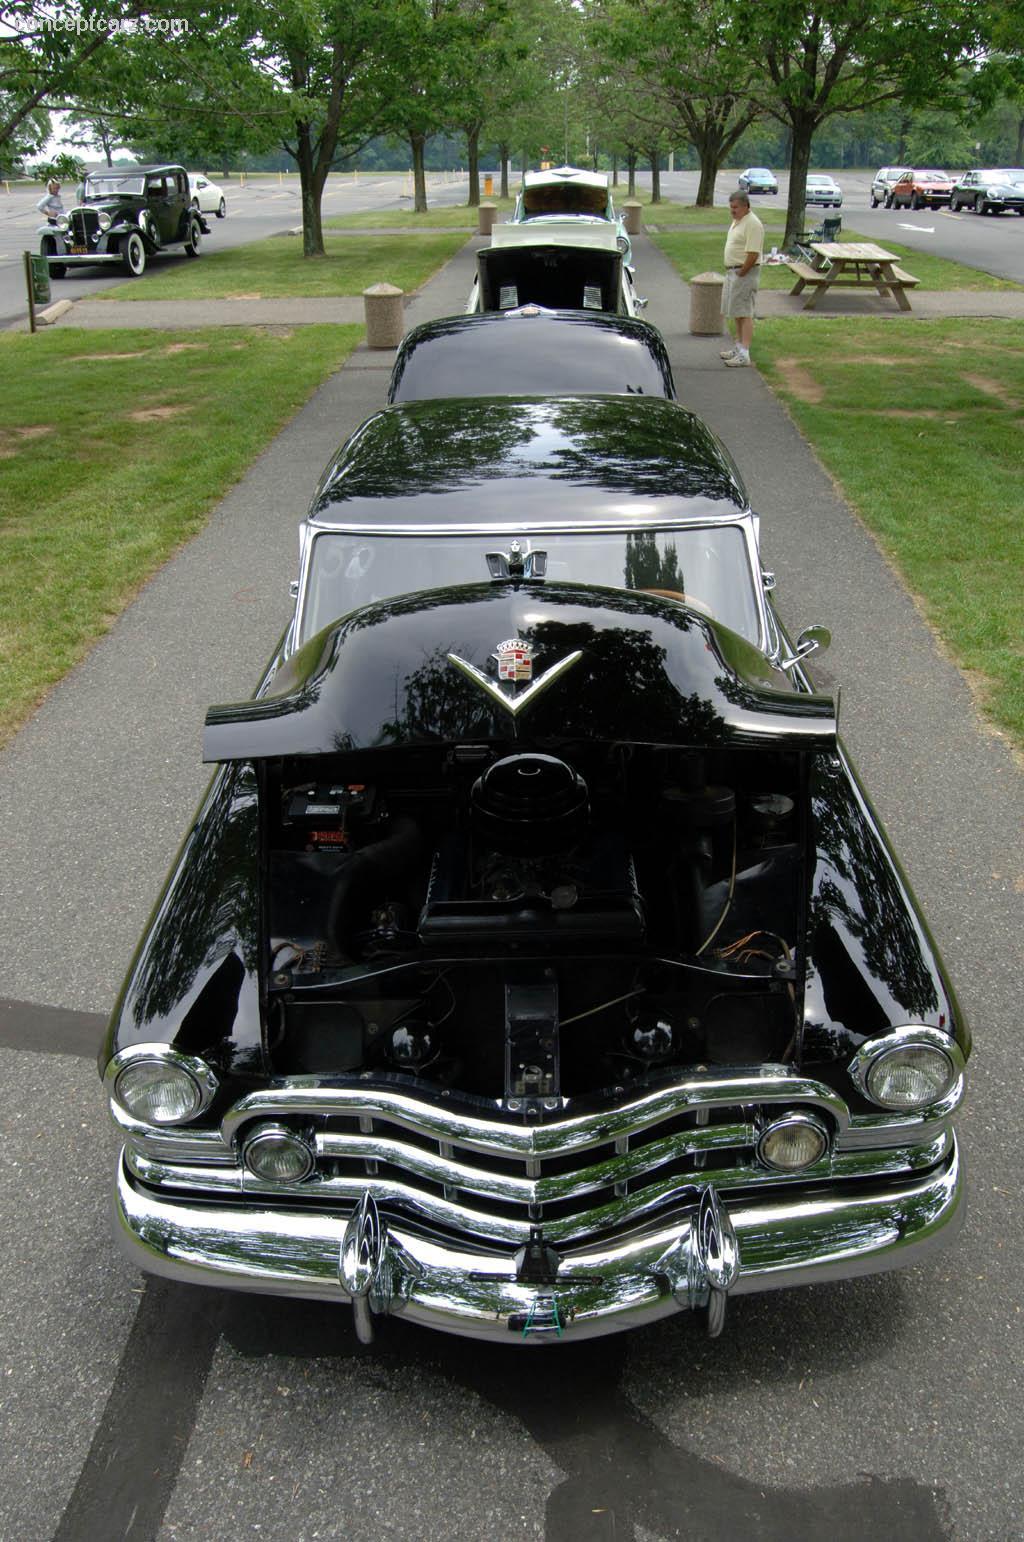 Cadillac Price >> 1950 Cadillac Series 75 Image. Photo 2 of 7